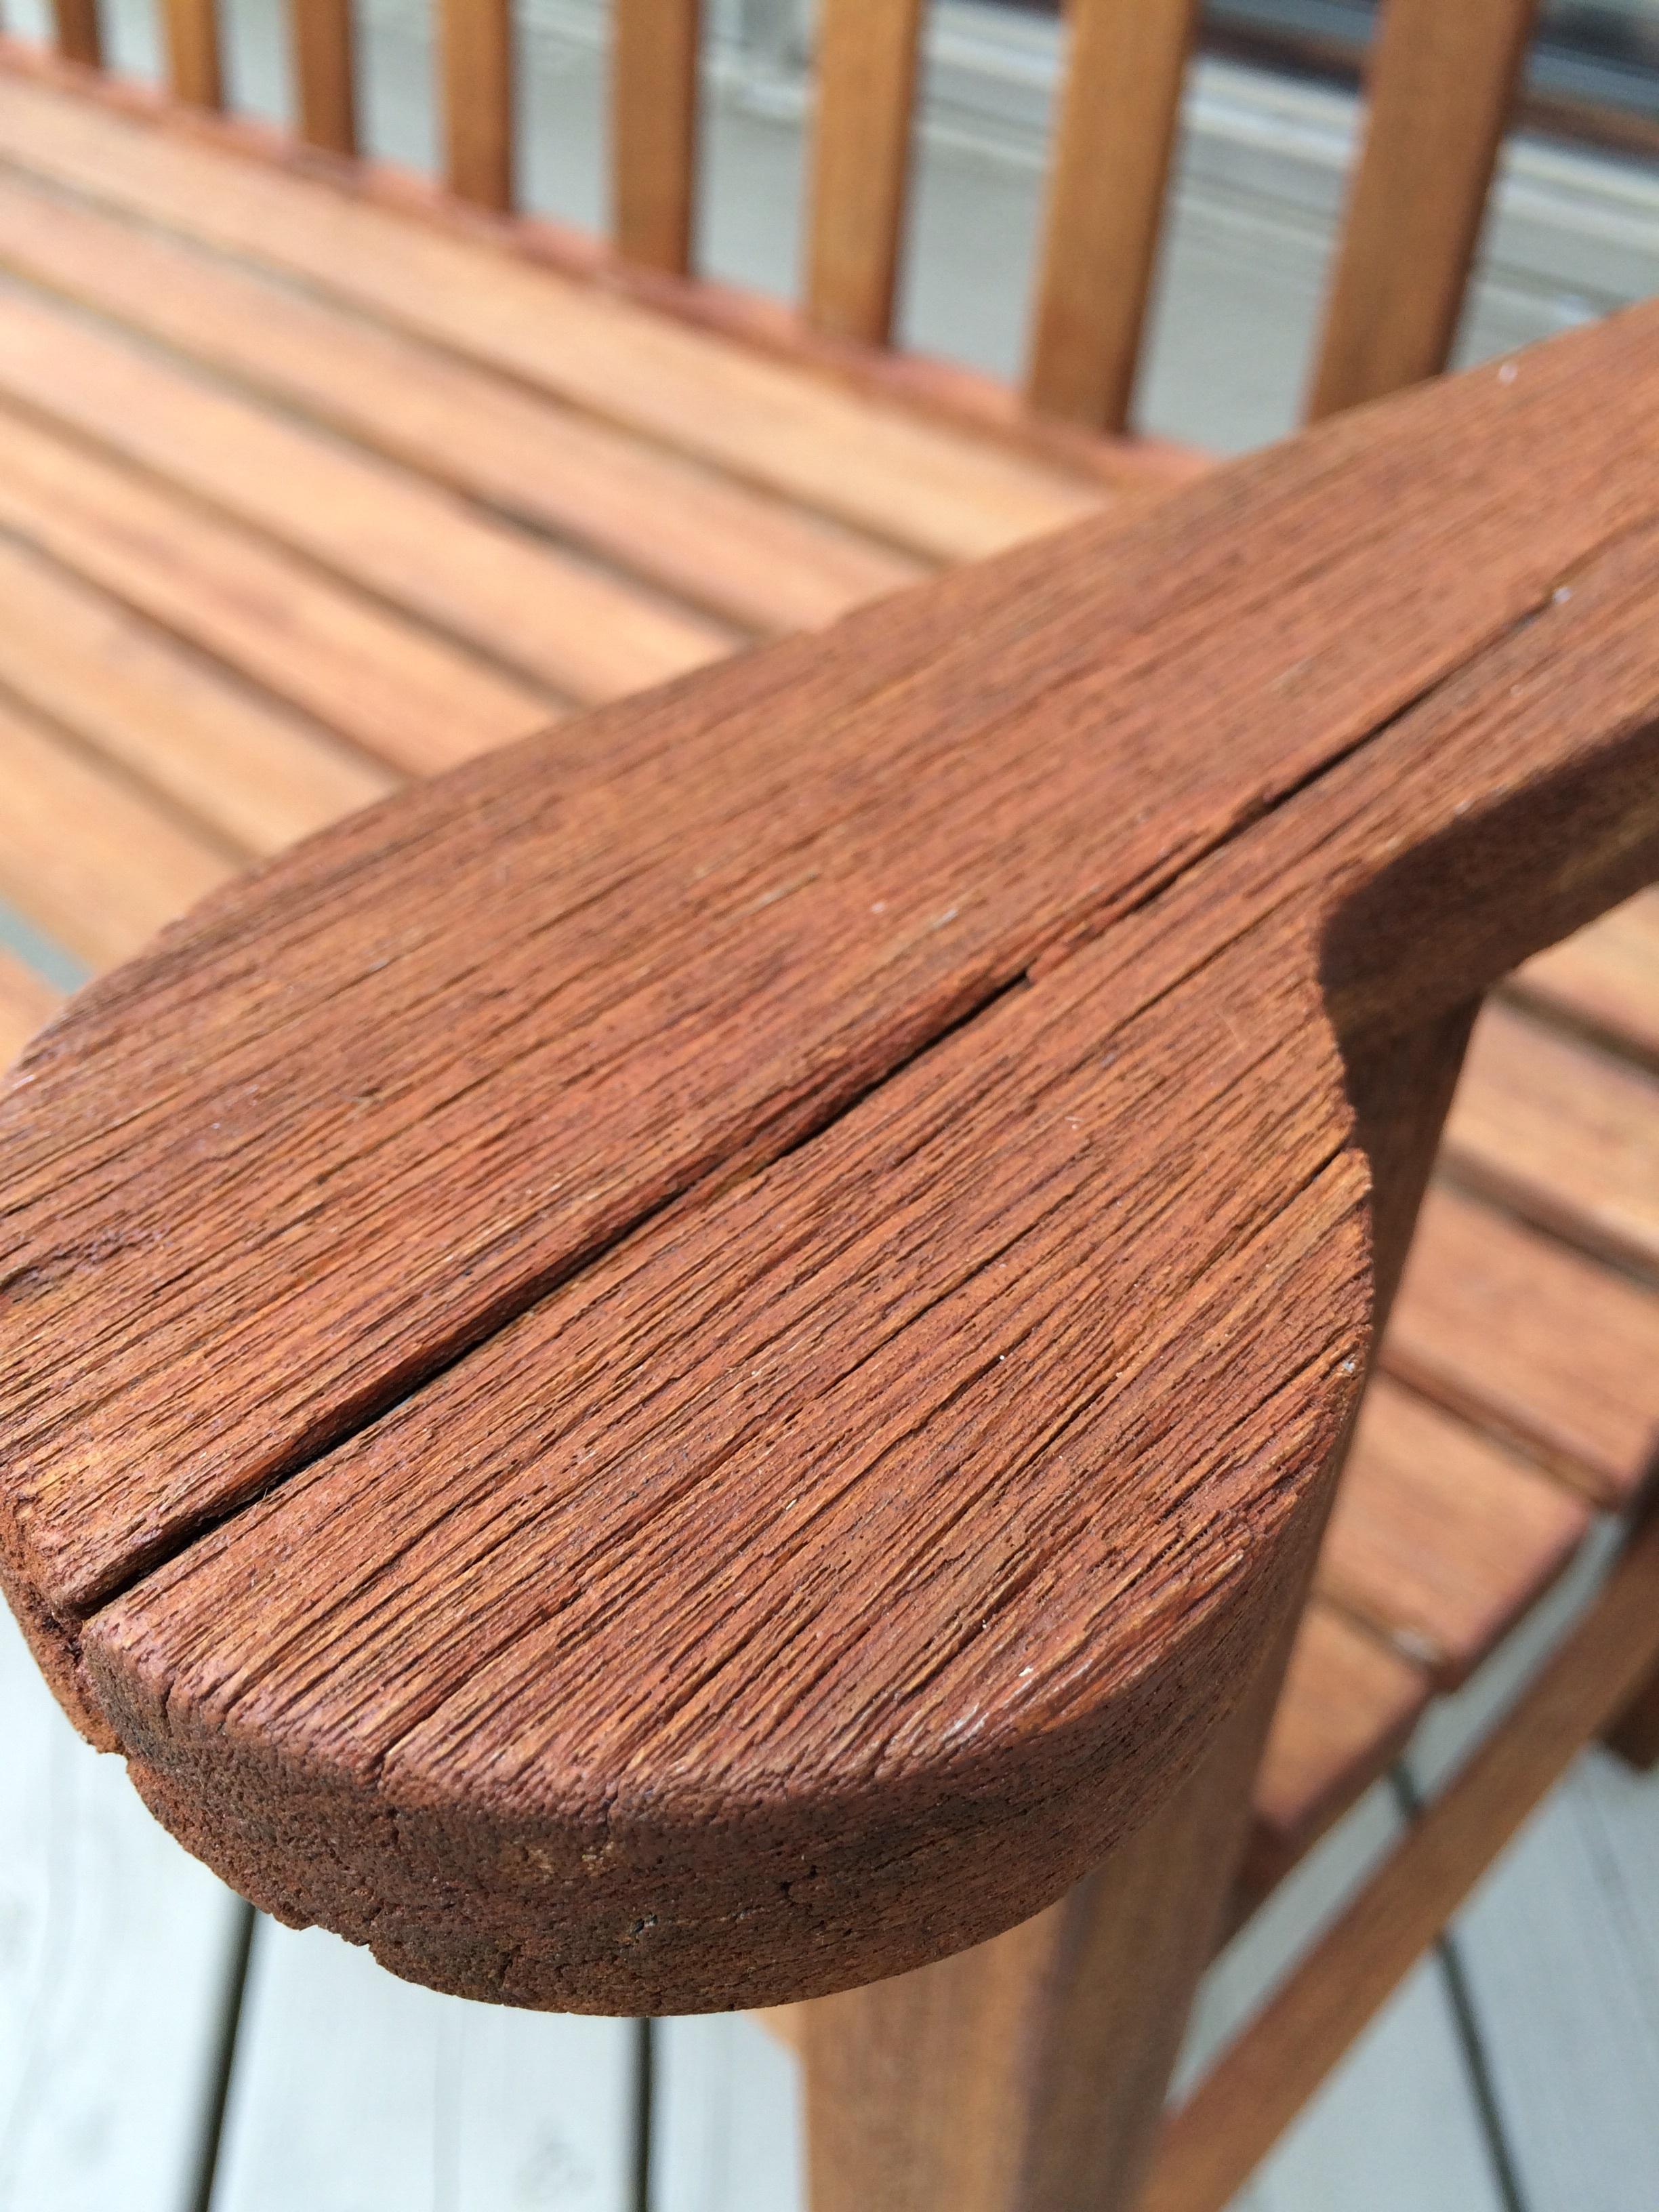 Fotos gratis : mesa, banco, silla, piso, antiguo, seco, patio ...